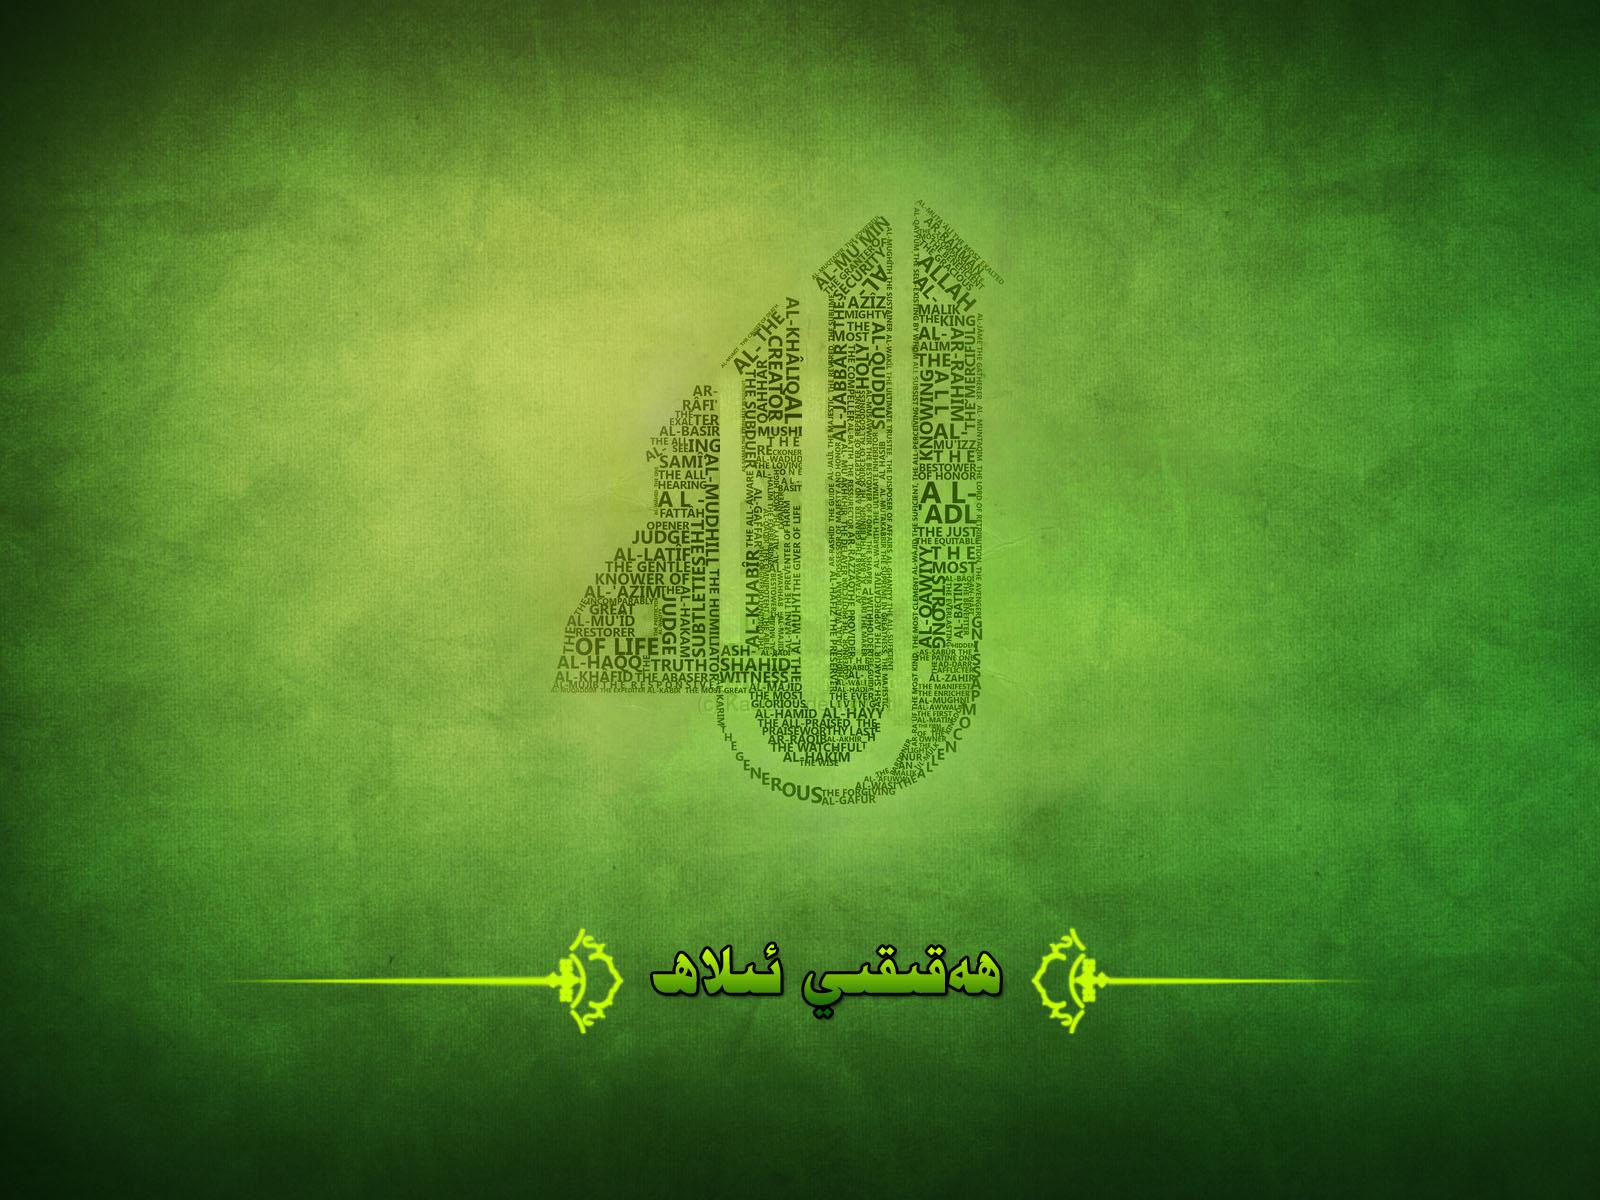 The most beautiful names of allah 99 names of allah allah the most beautiful names of allah 99 names of allah allah kaarim allah is greatest toneelgroepblik Choice Image